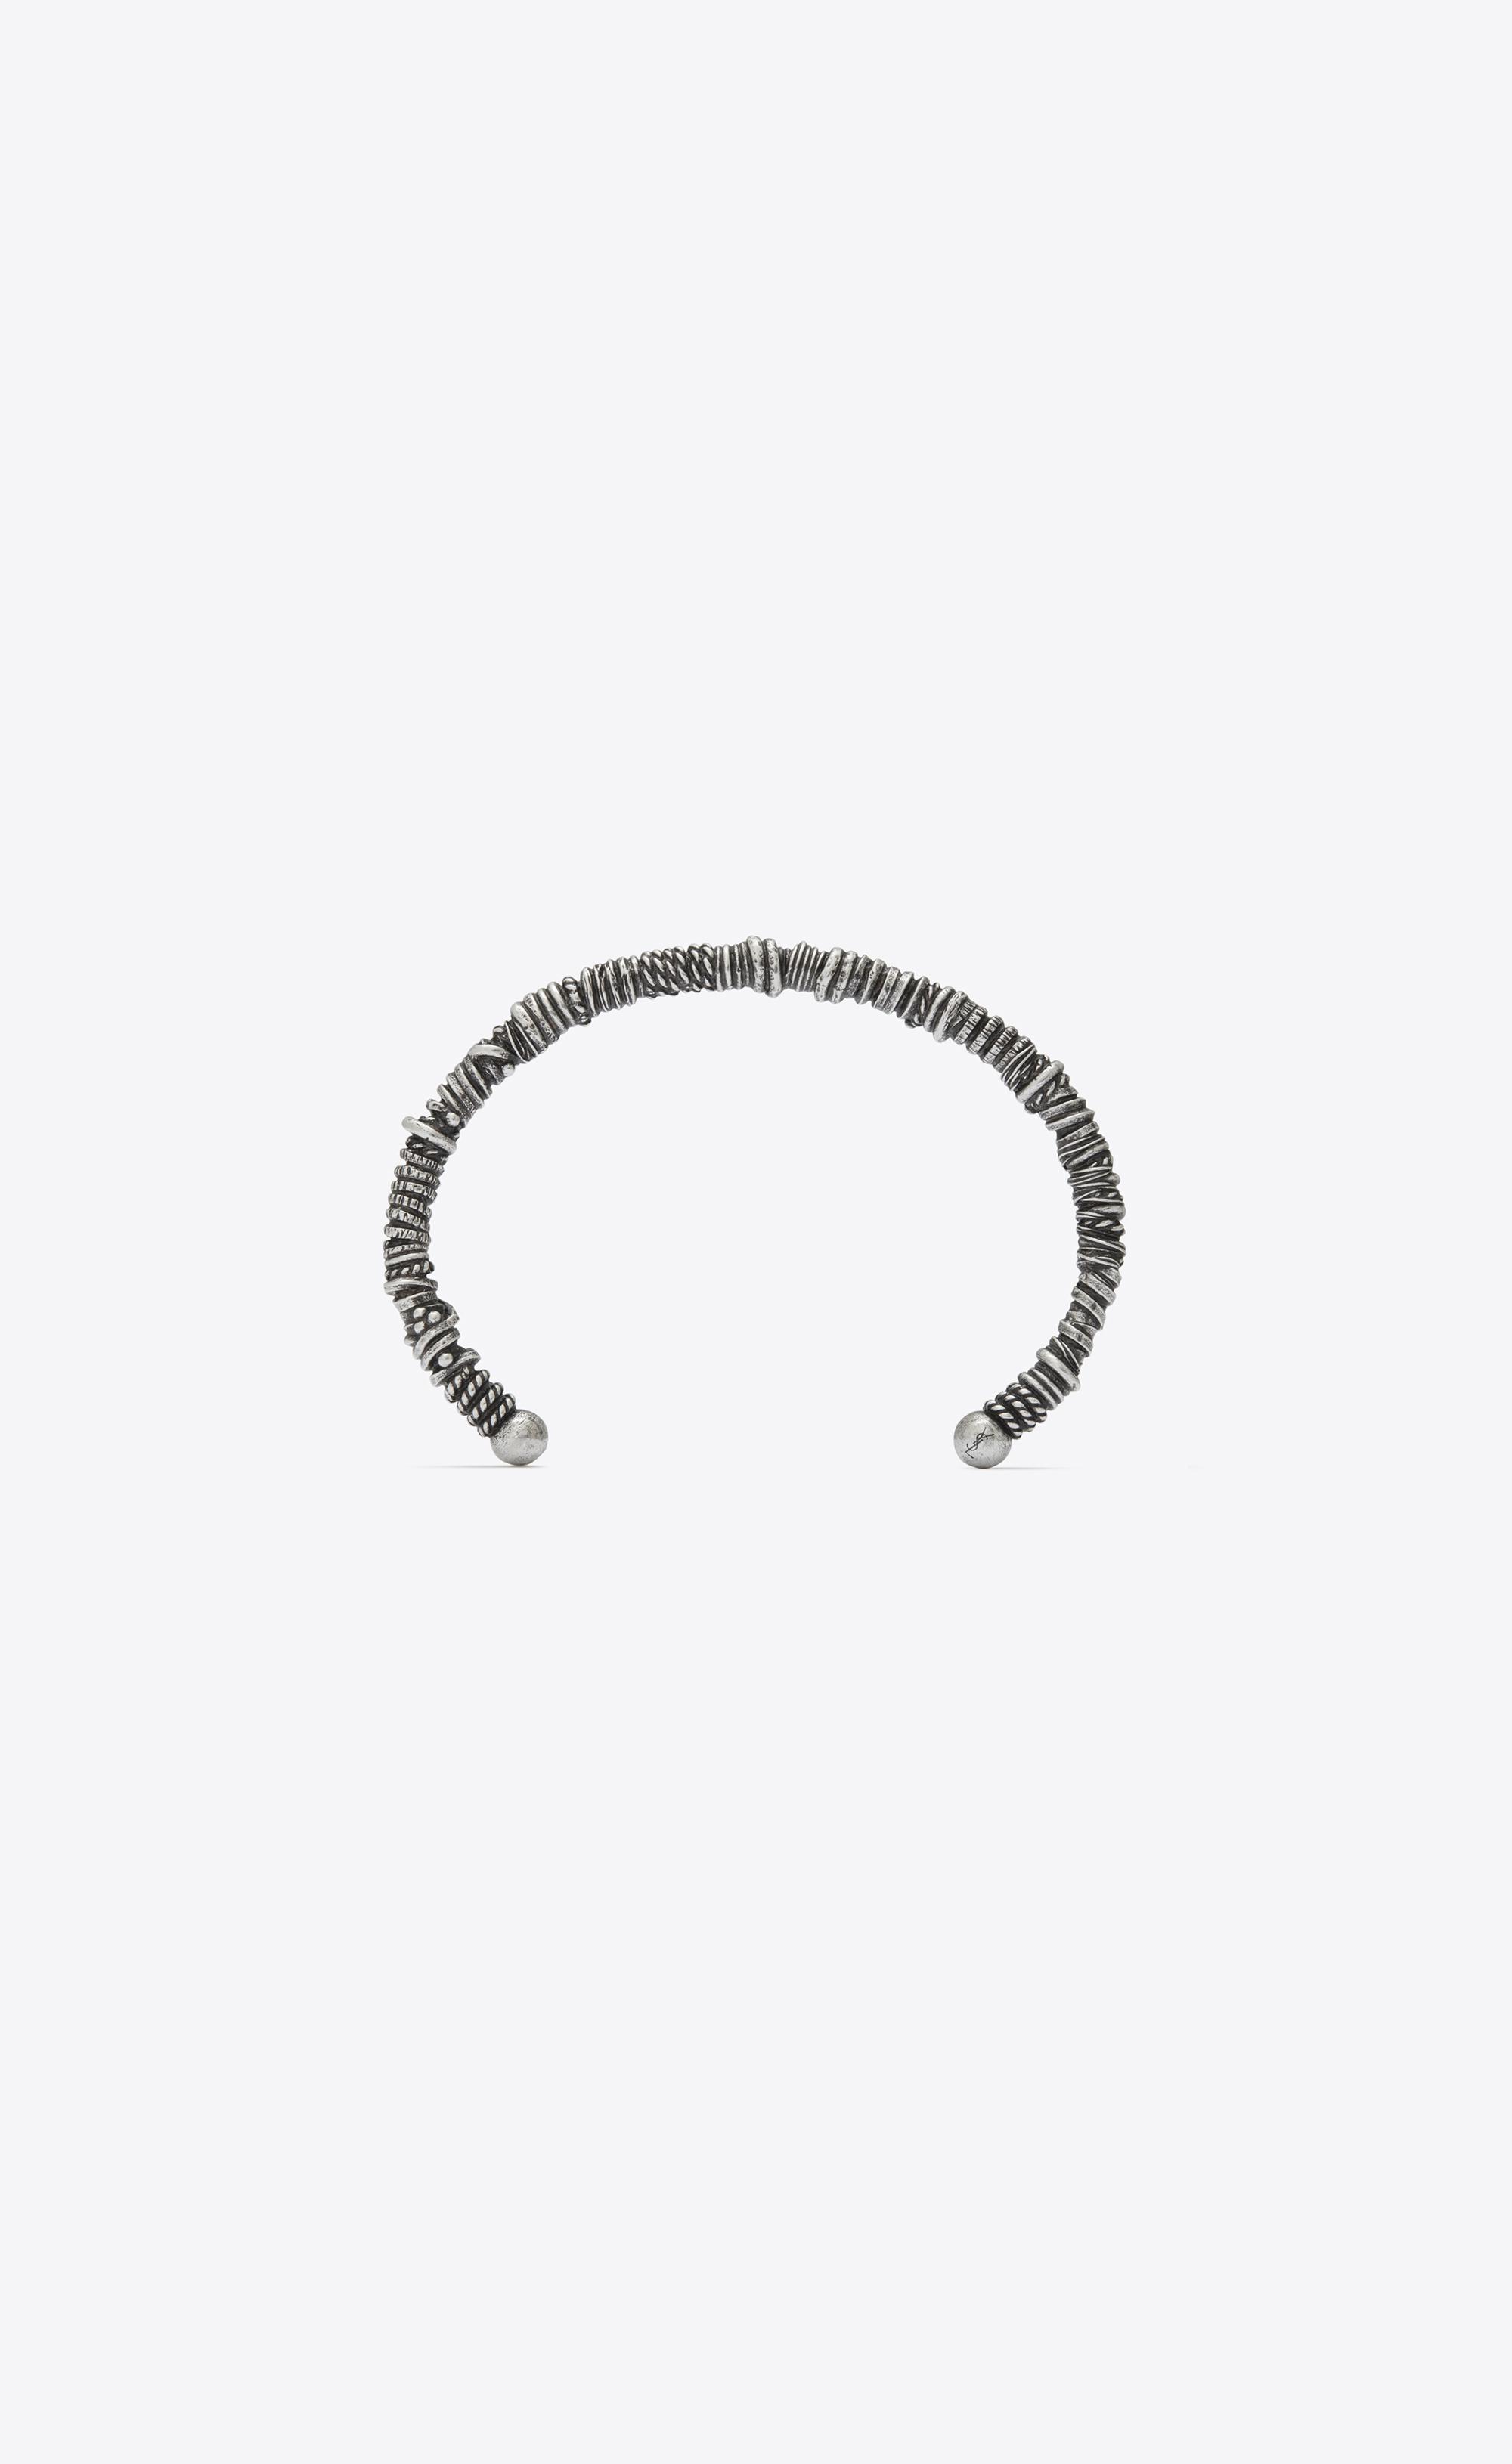 e4e3c07826 Saint Laurent Marrakech Berber Bangle Bracelet In Silver-toned Brass ...